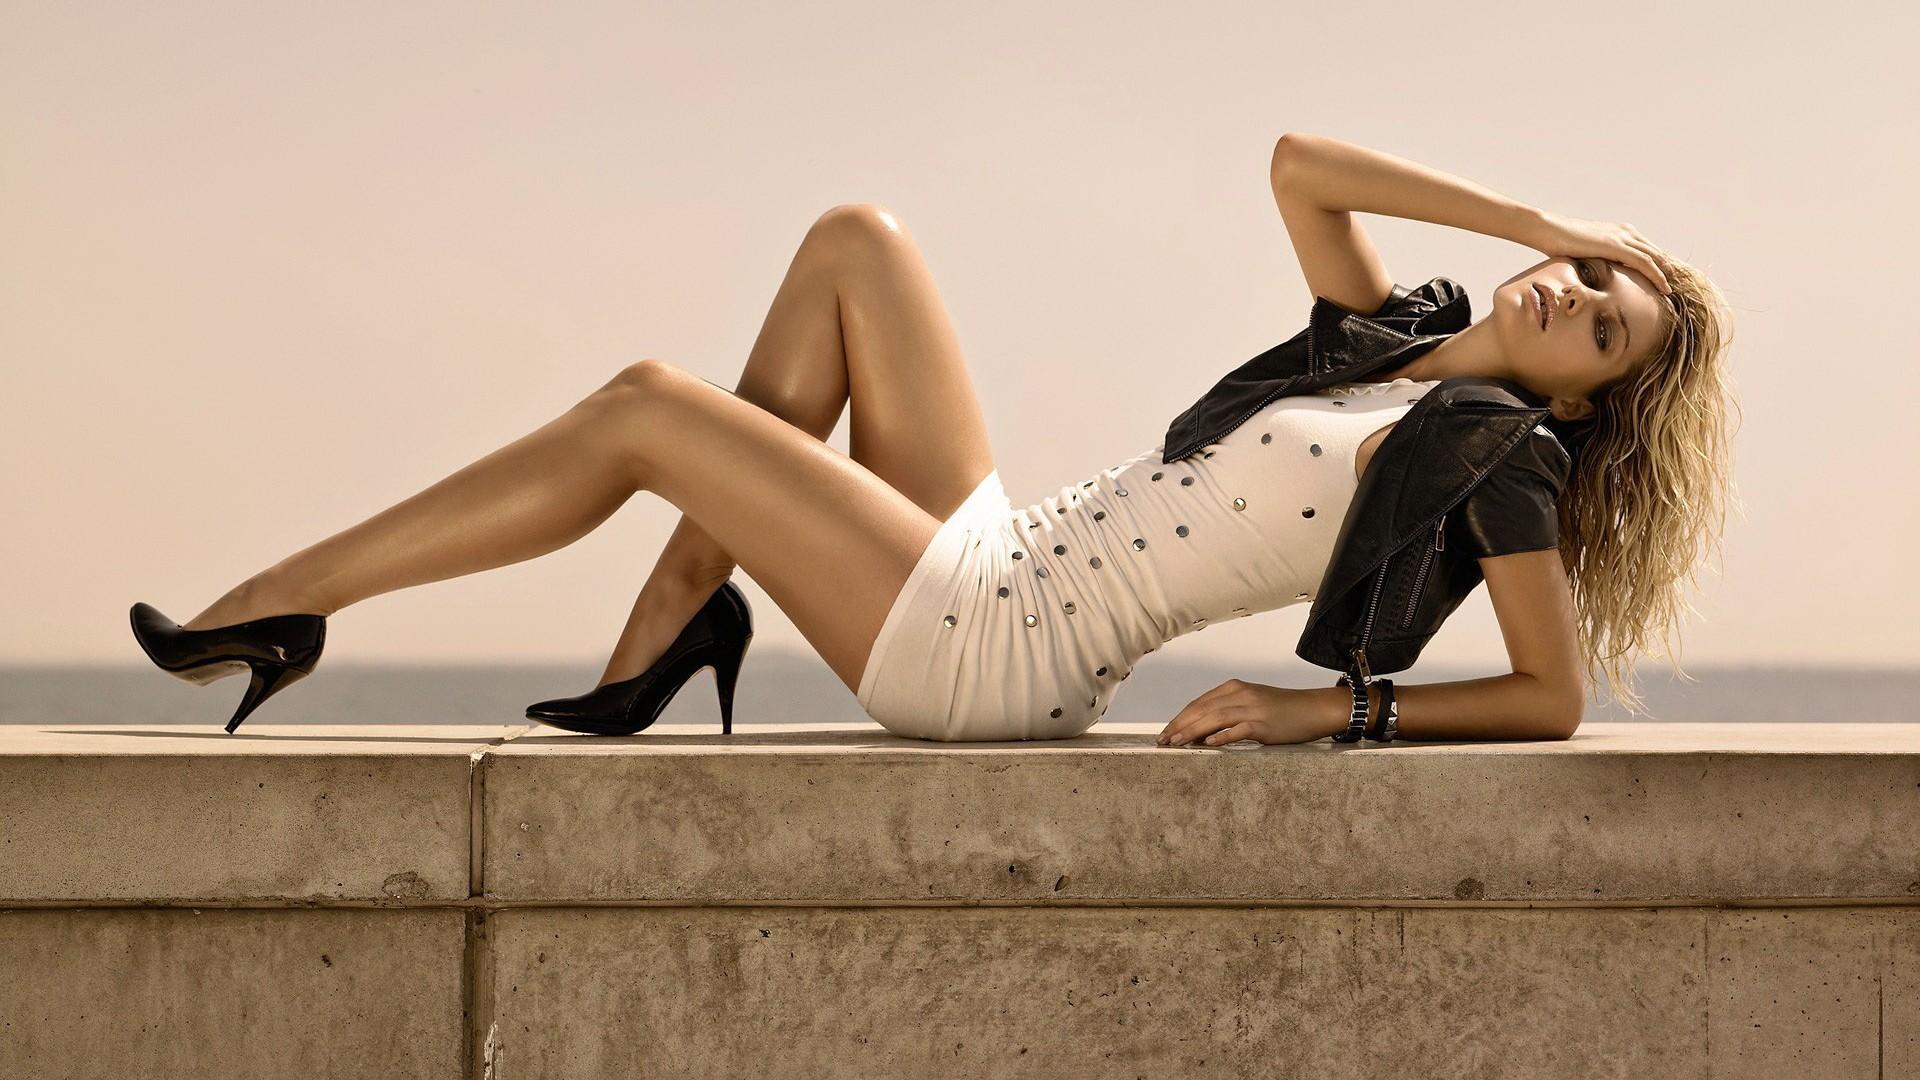 Wallpaper : model, long hair, sitting, high heels, blue